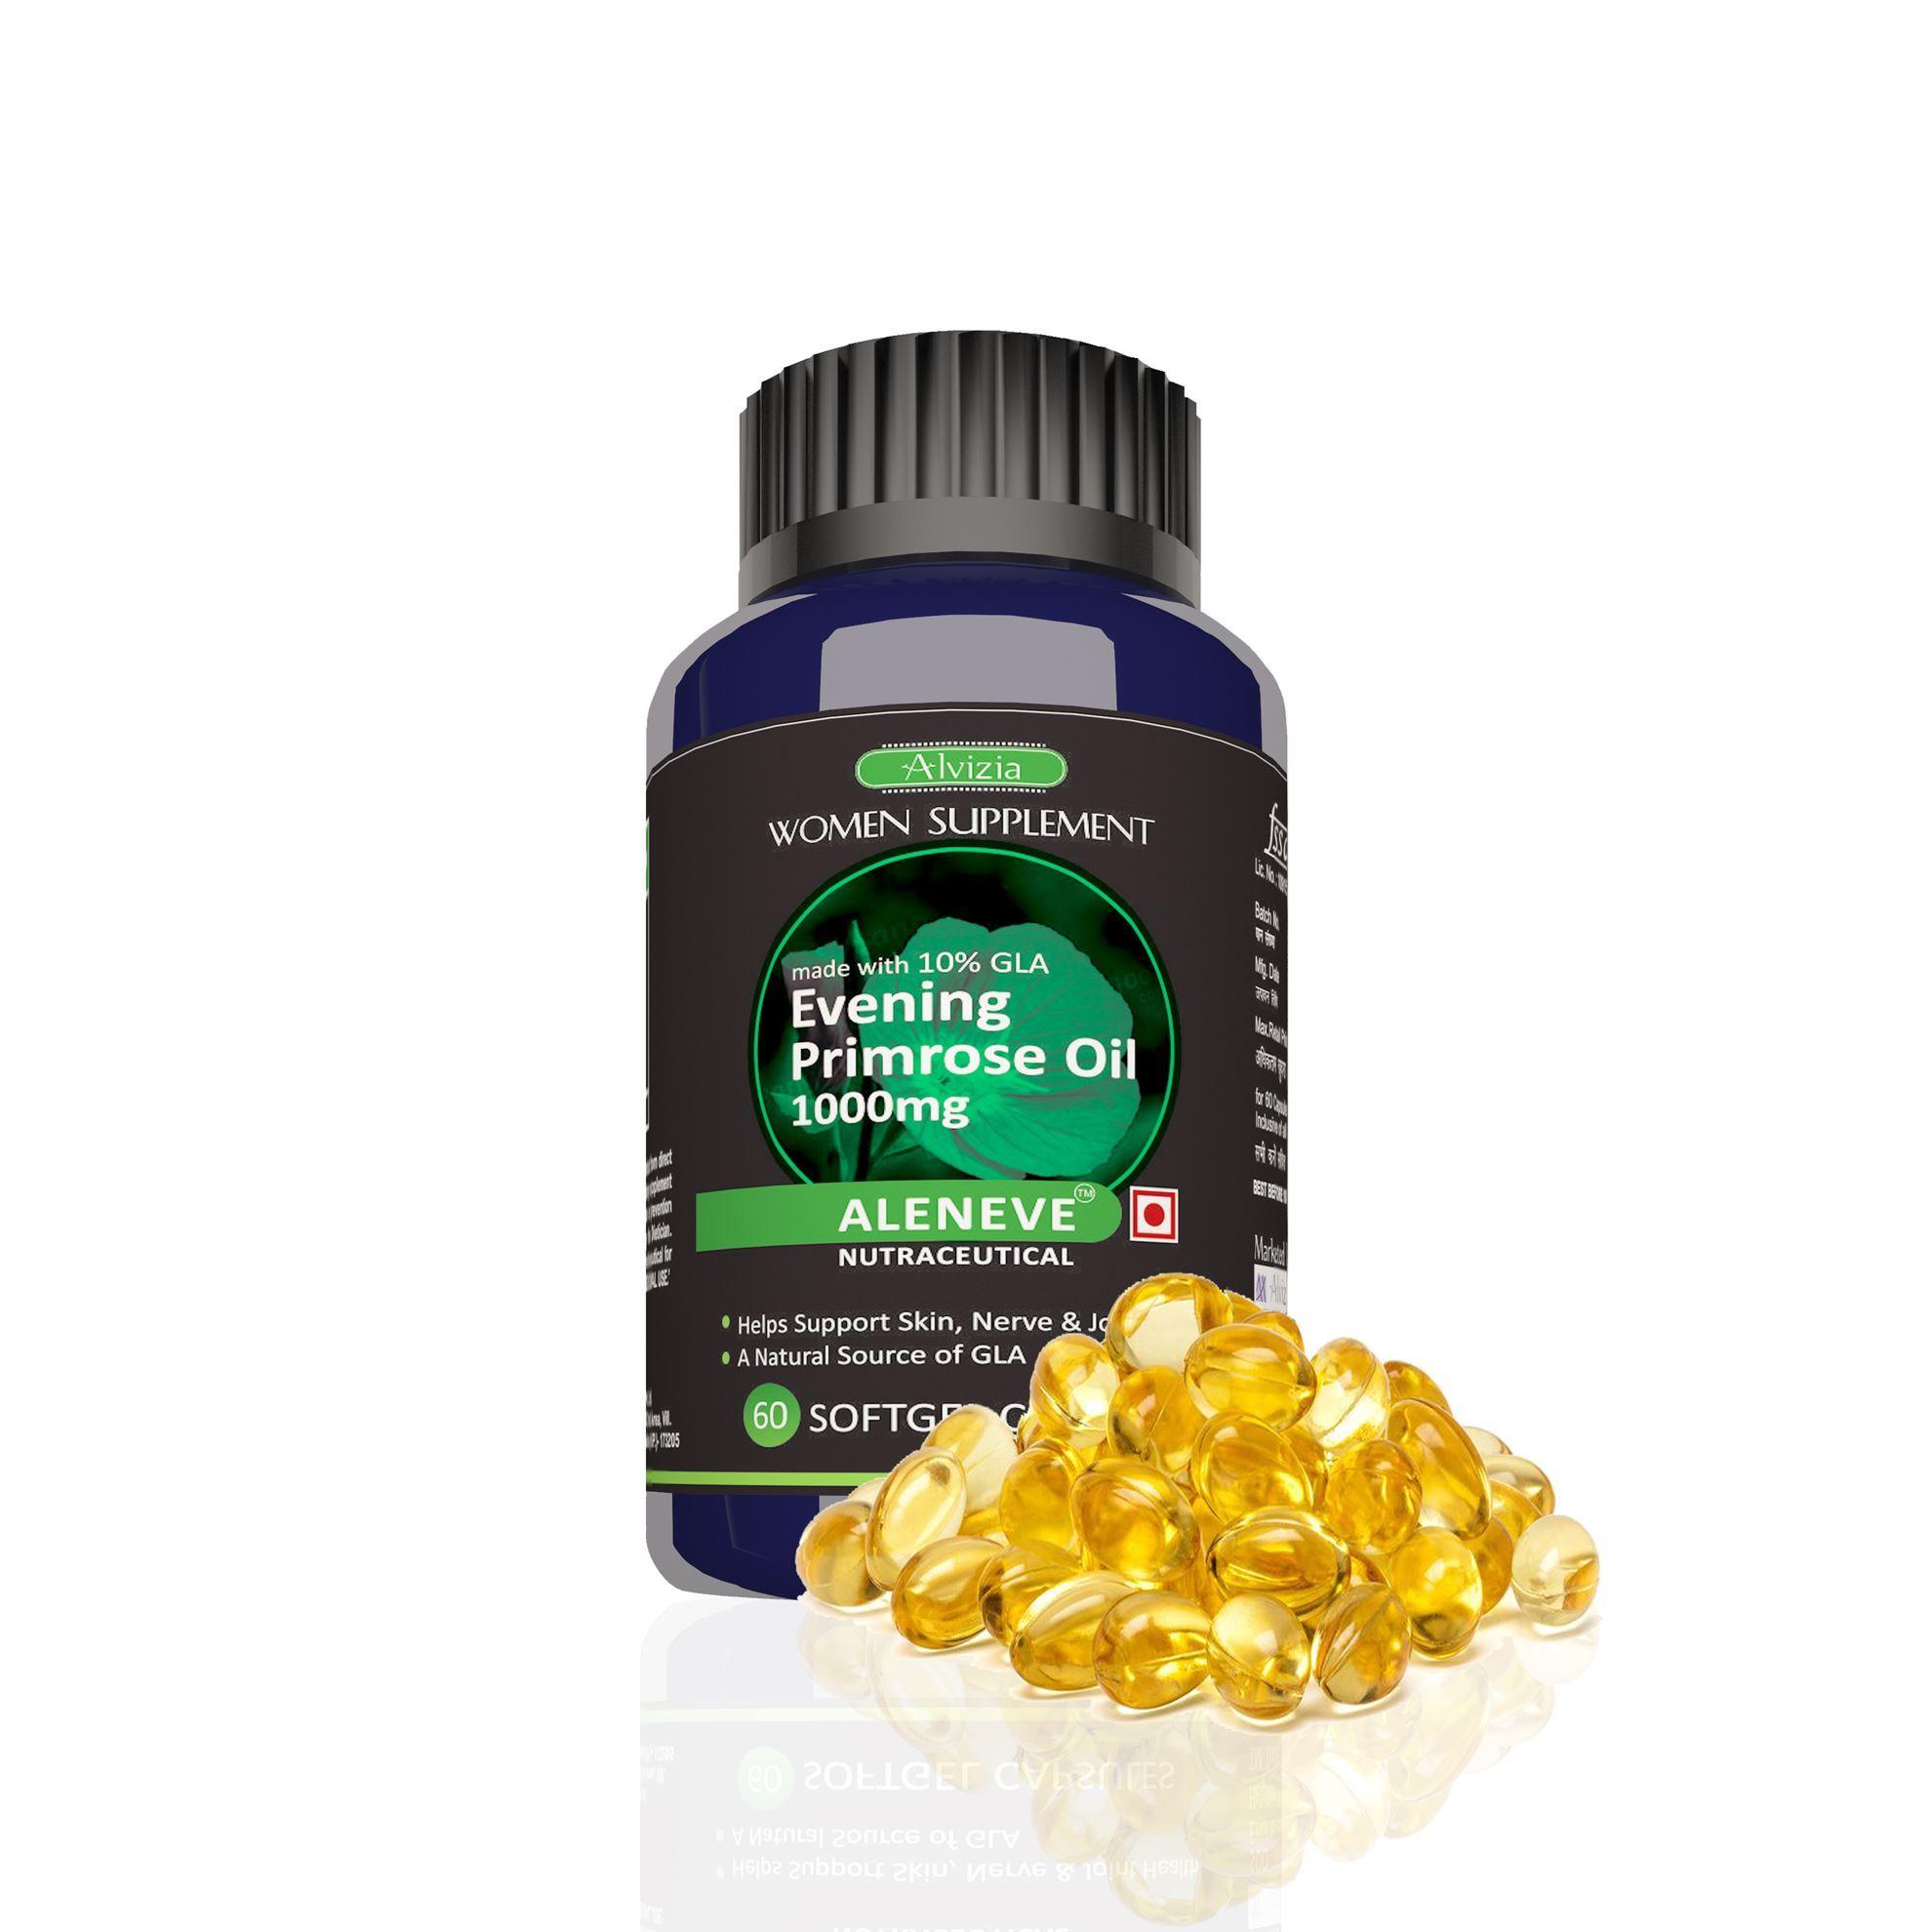 Picture of Alvizia Evening Primrose Oil 1000 mg for Women's Health 60 Capsules